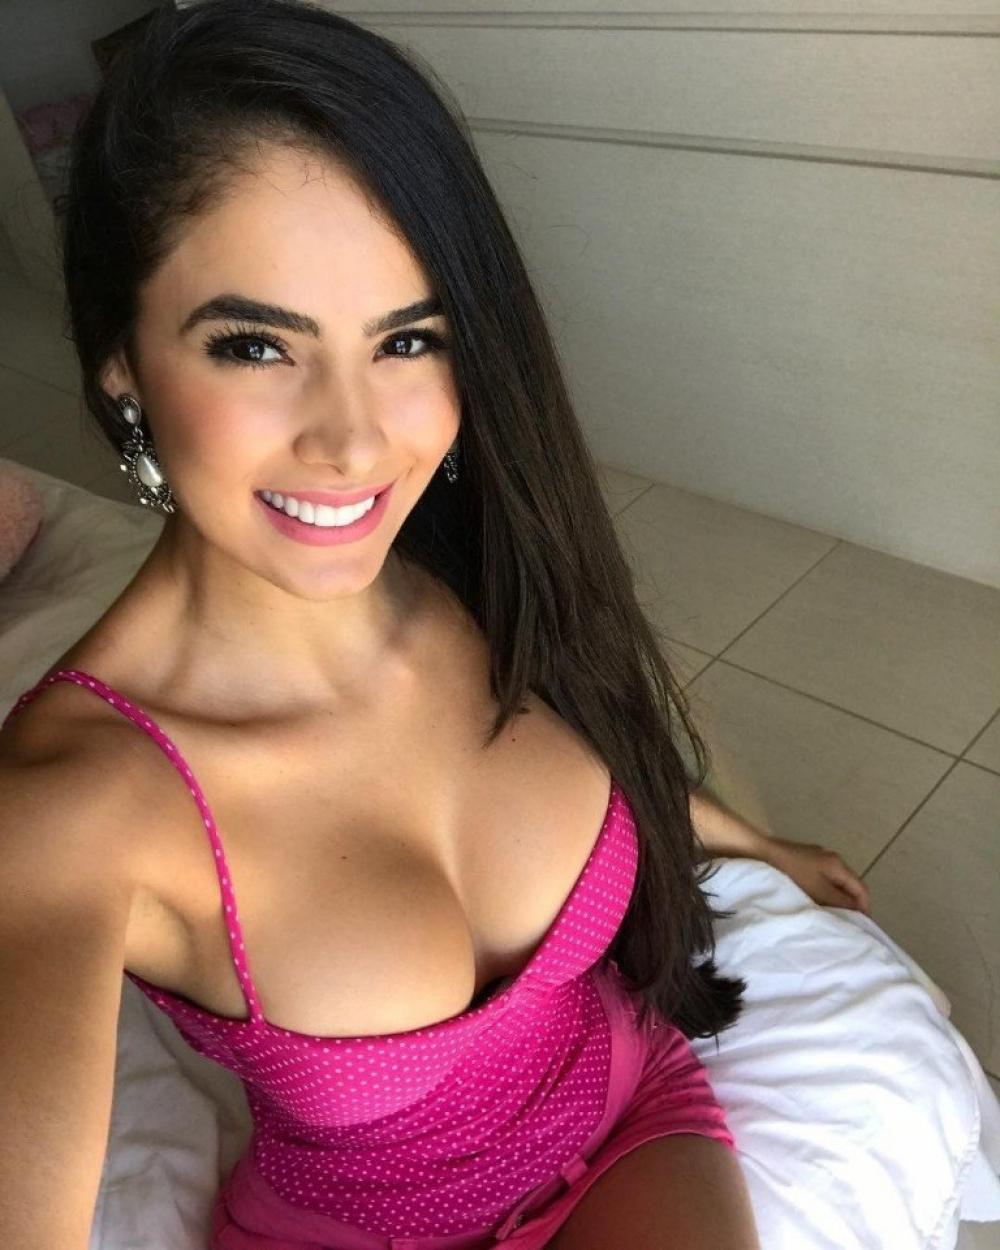 Busty lace bra